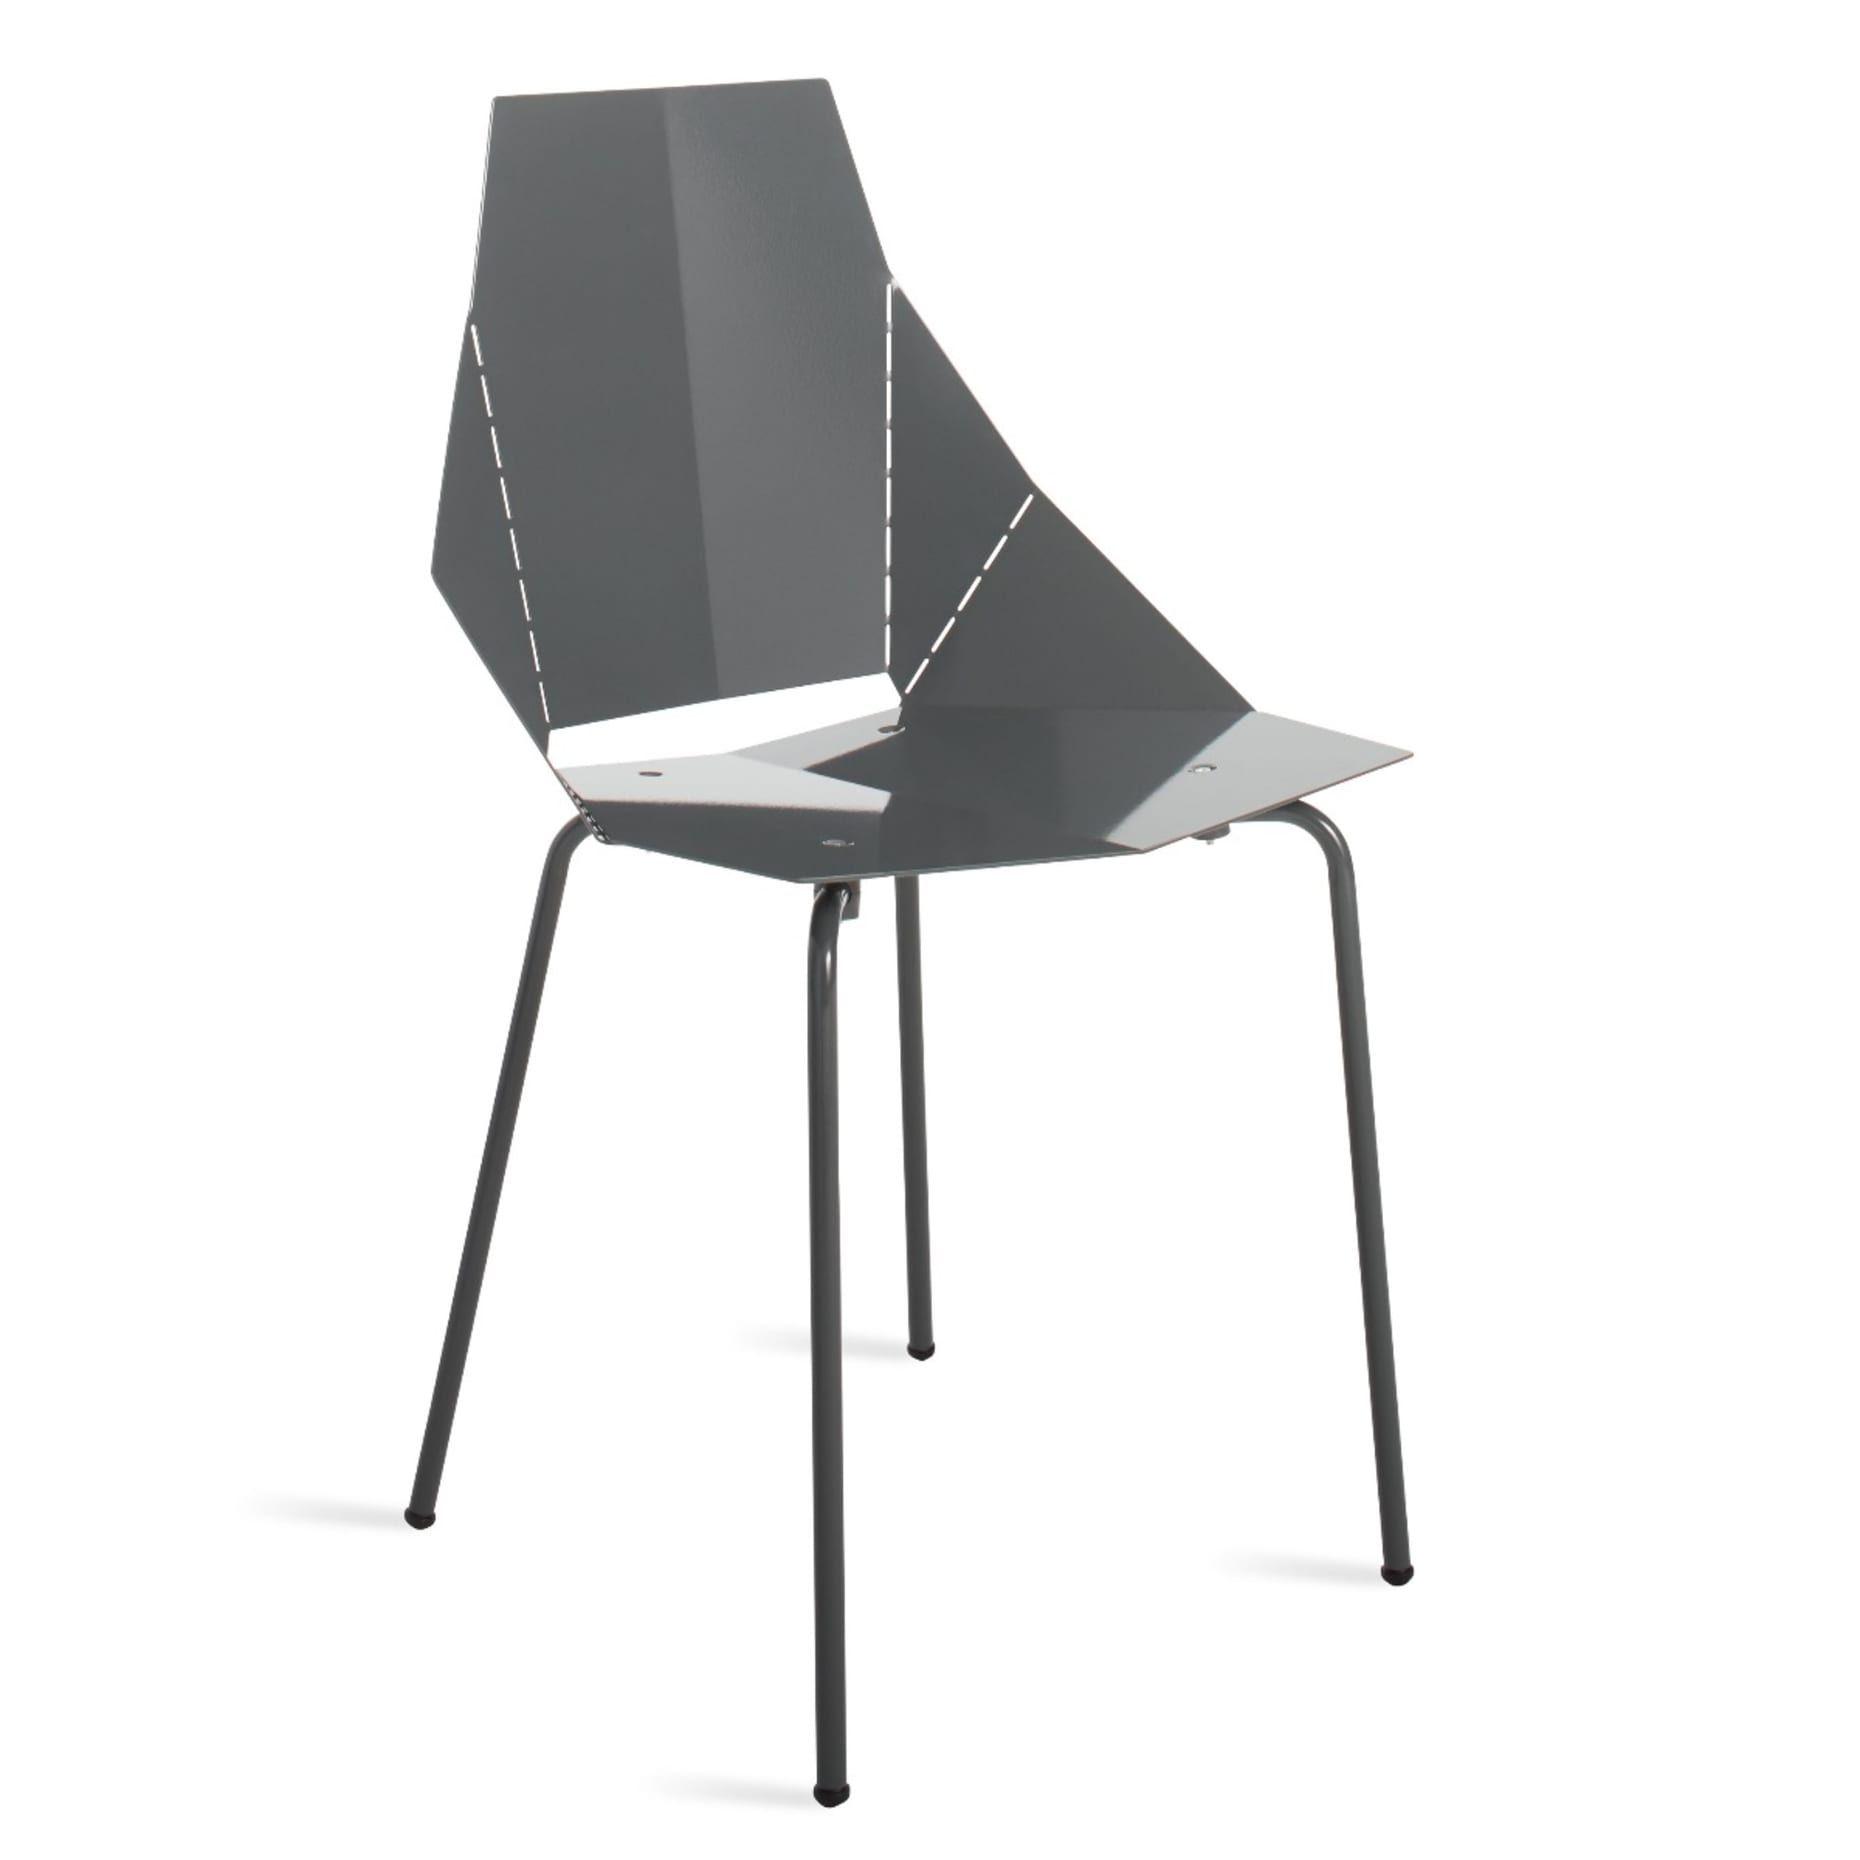 real good chair in 2018 1 2 2 0 f o r g e l o f t pinterest rh pinterest com